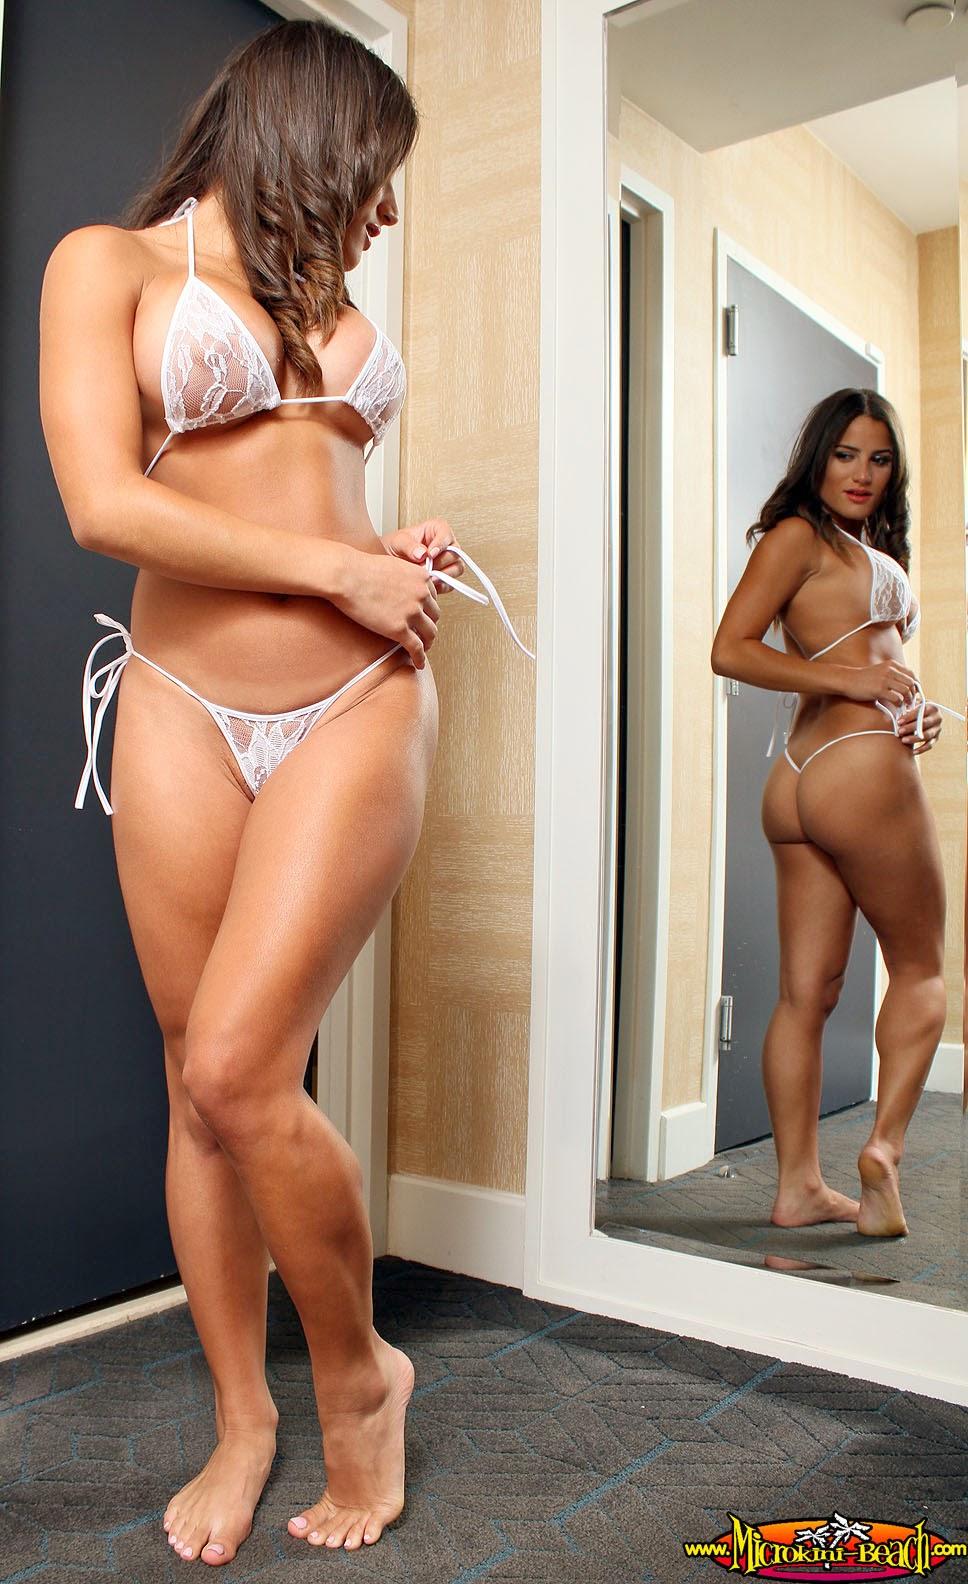 chichi in bikini